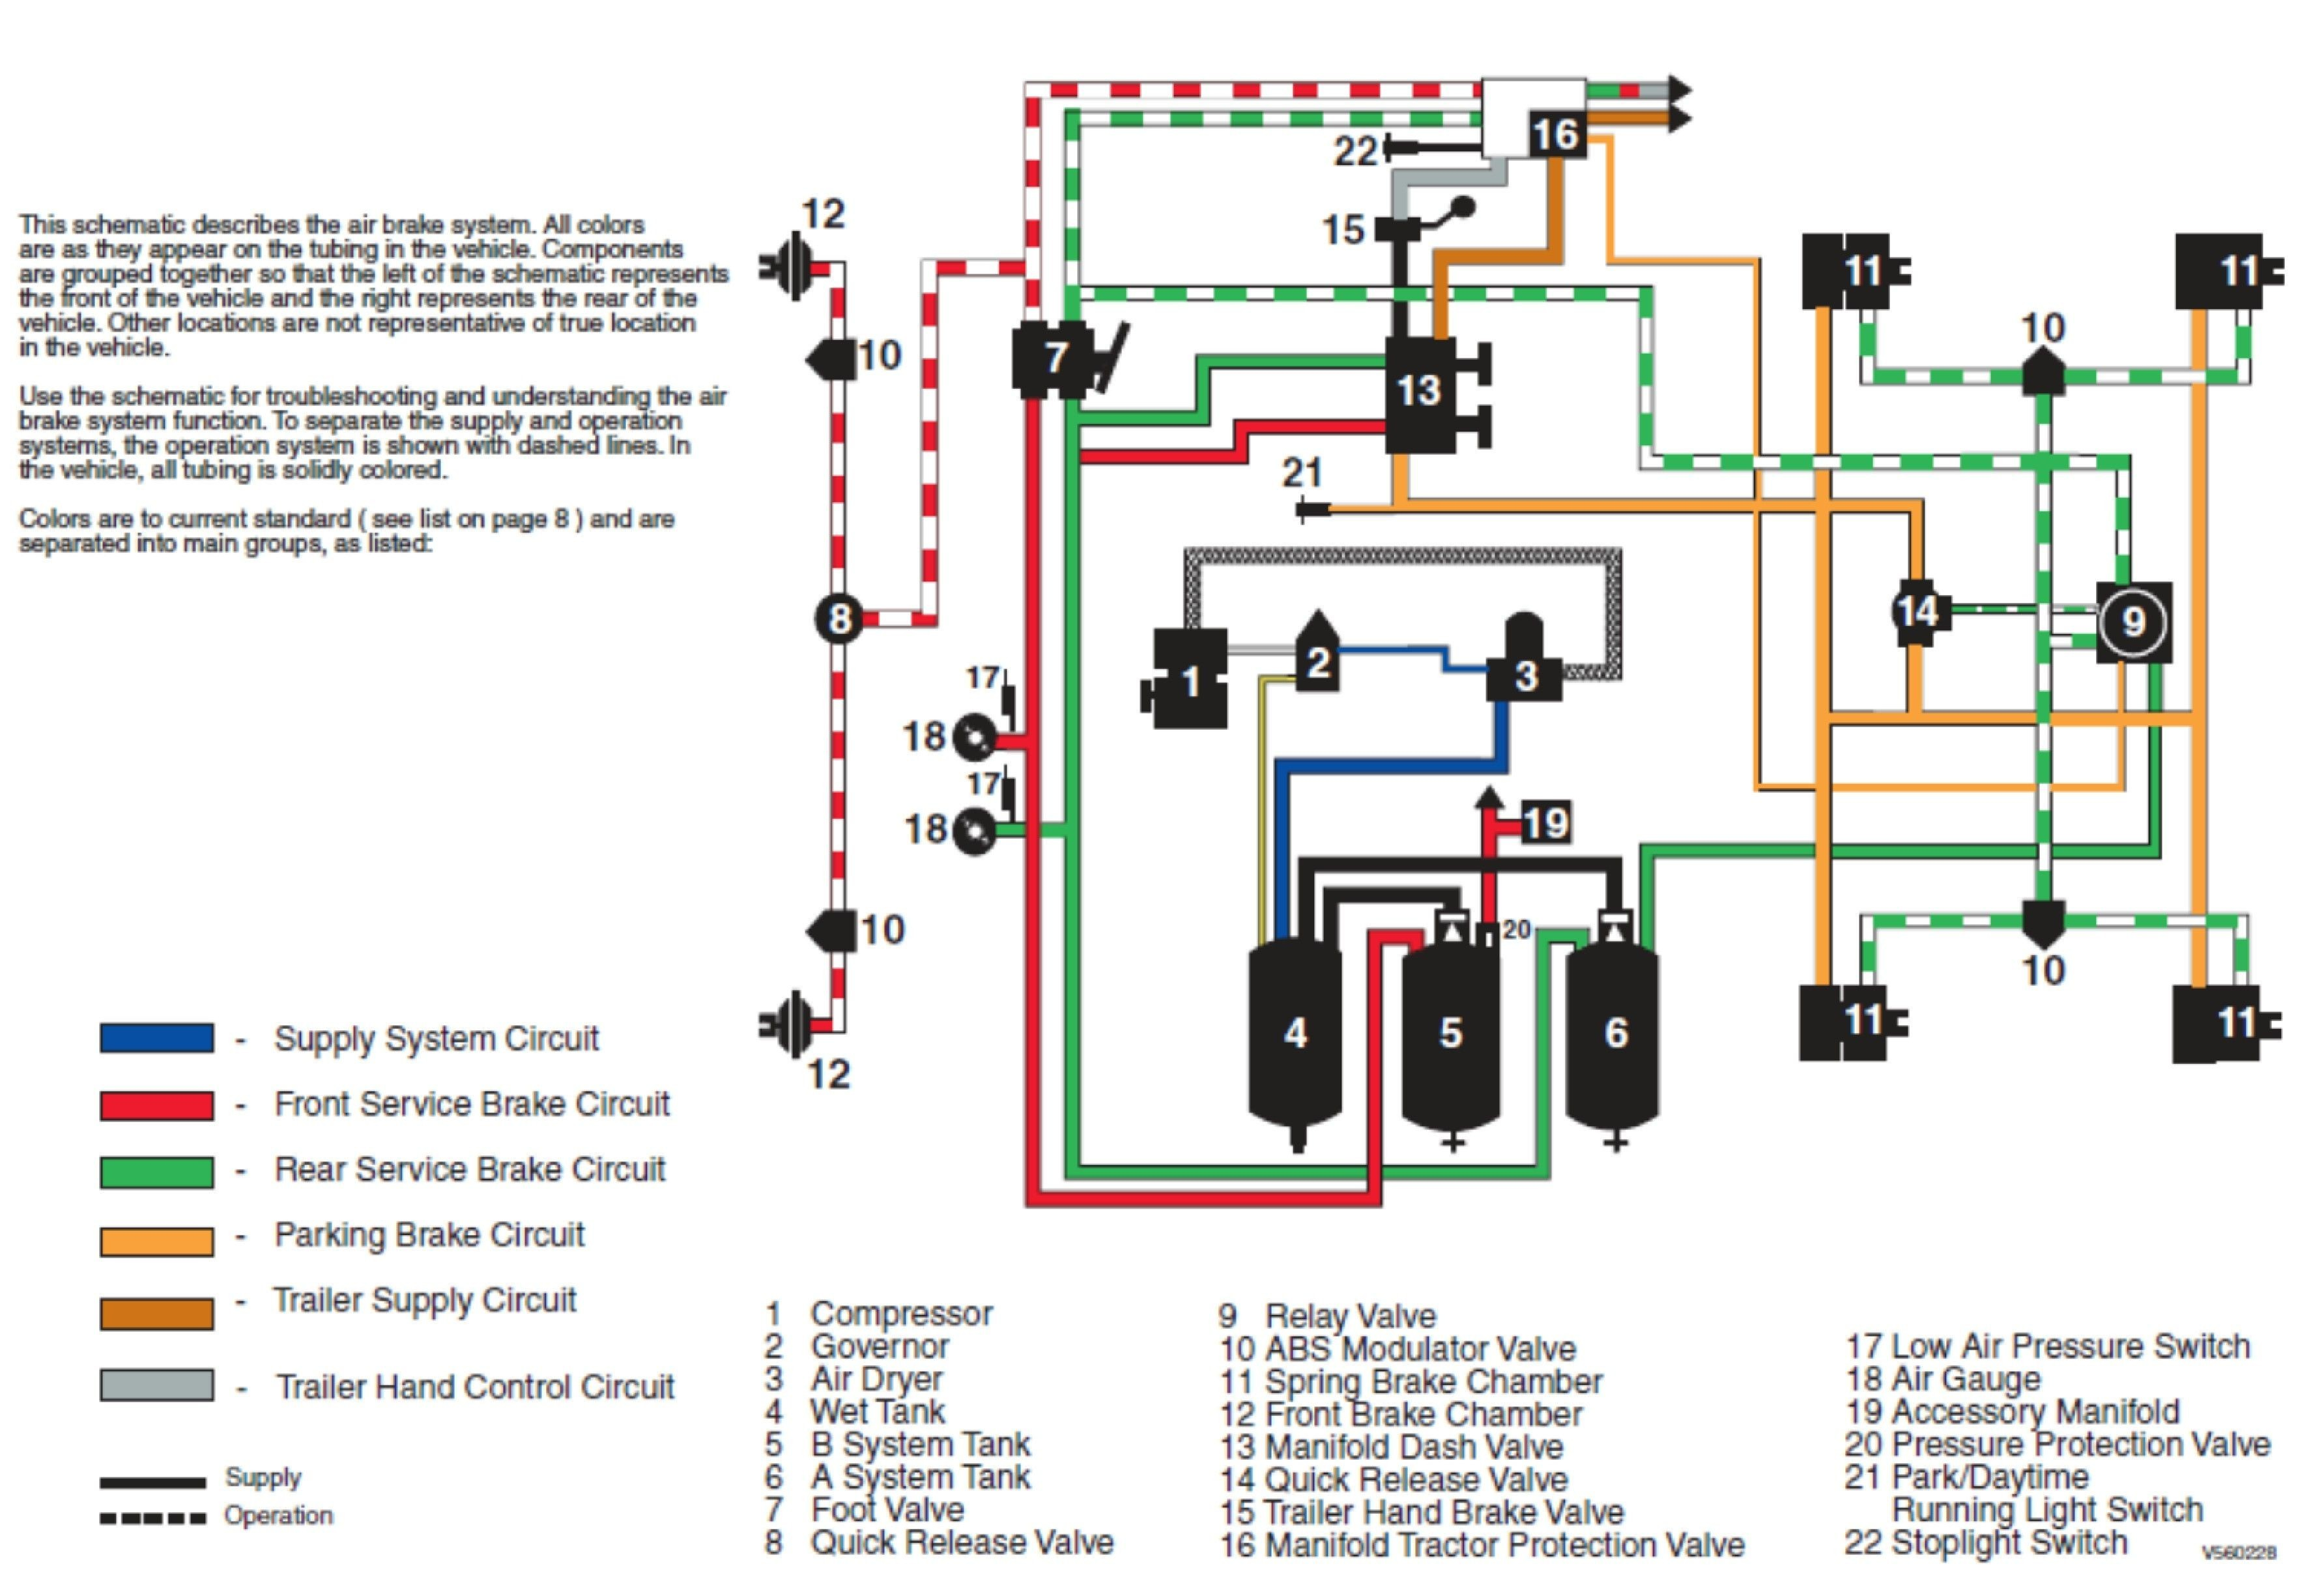 Air Brake Foot Valve Diagram Brake Chamber Diagram Tractor Trailer Air Brake System Diagram – My Of Air Brake Foot Valve Diagram